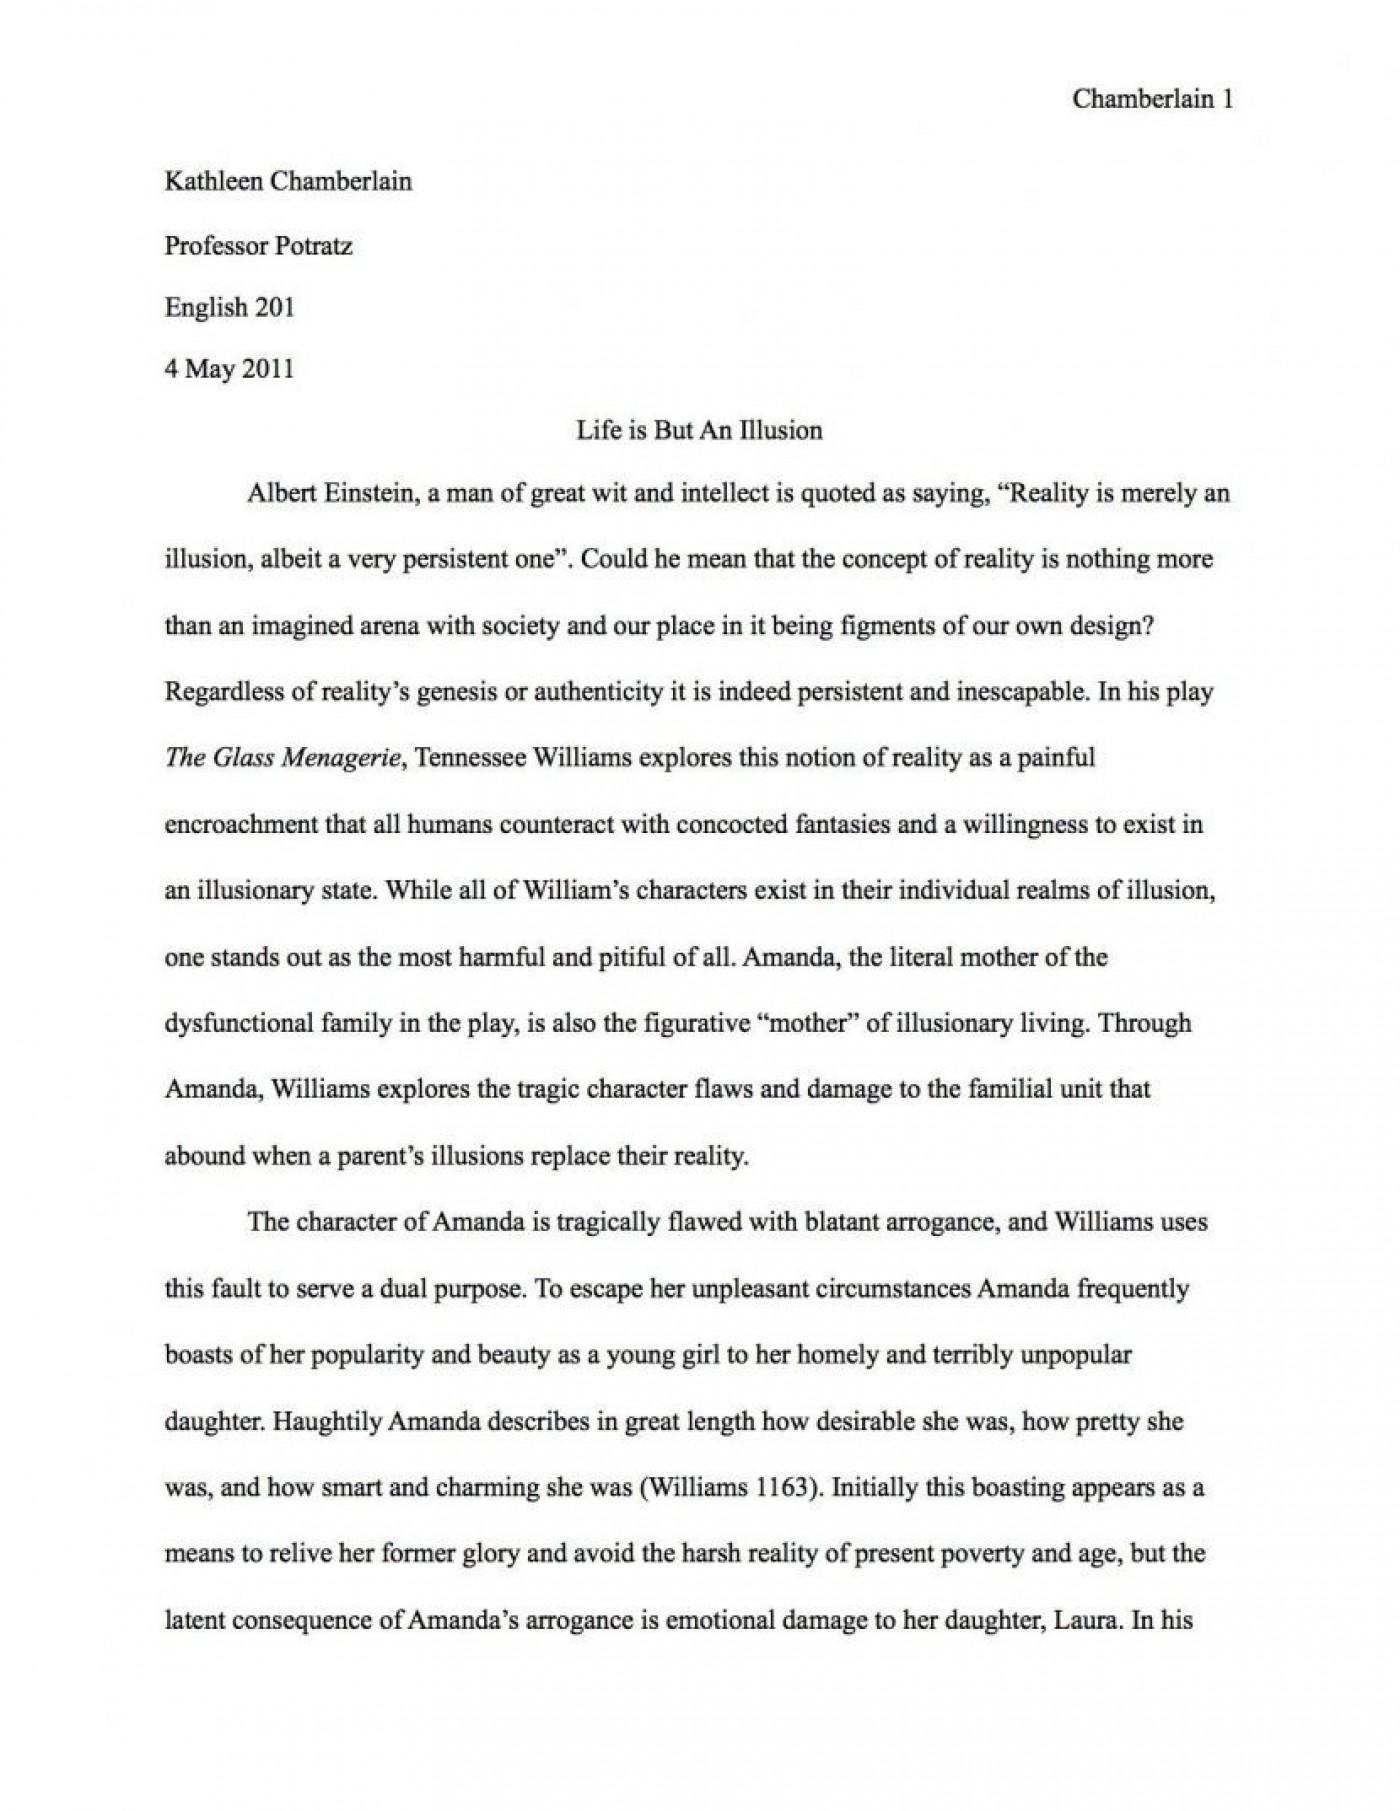 apa format introduction paragraph